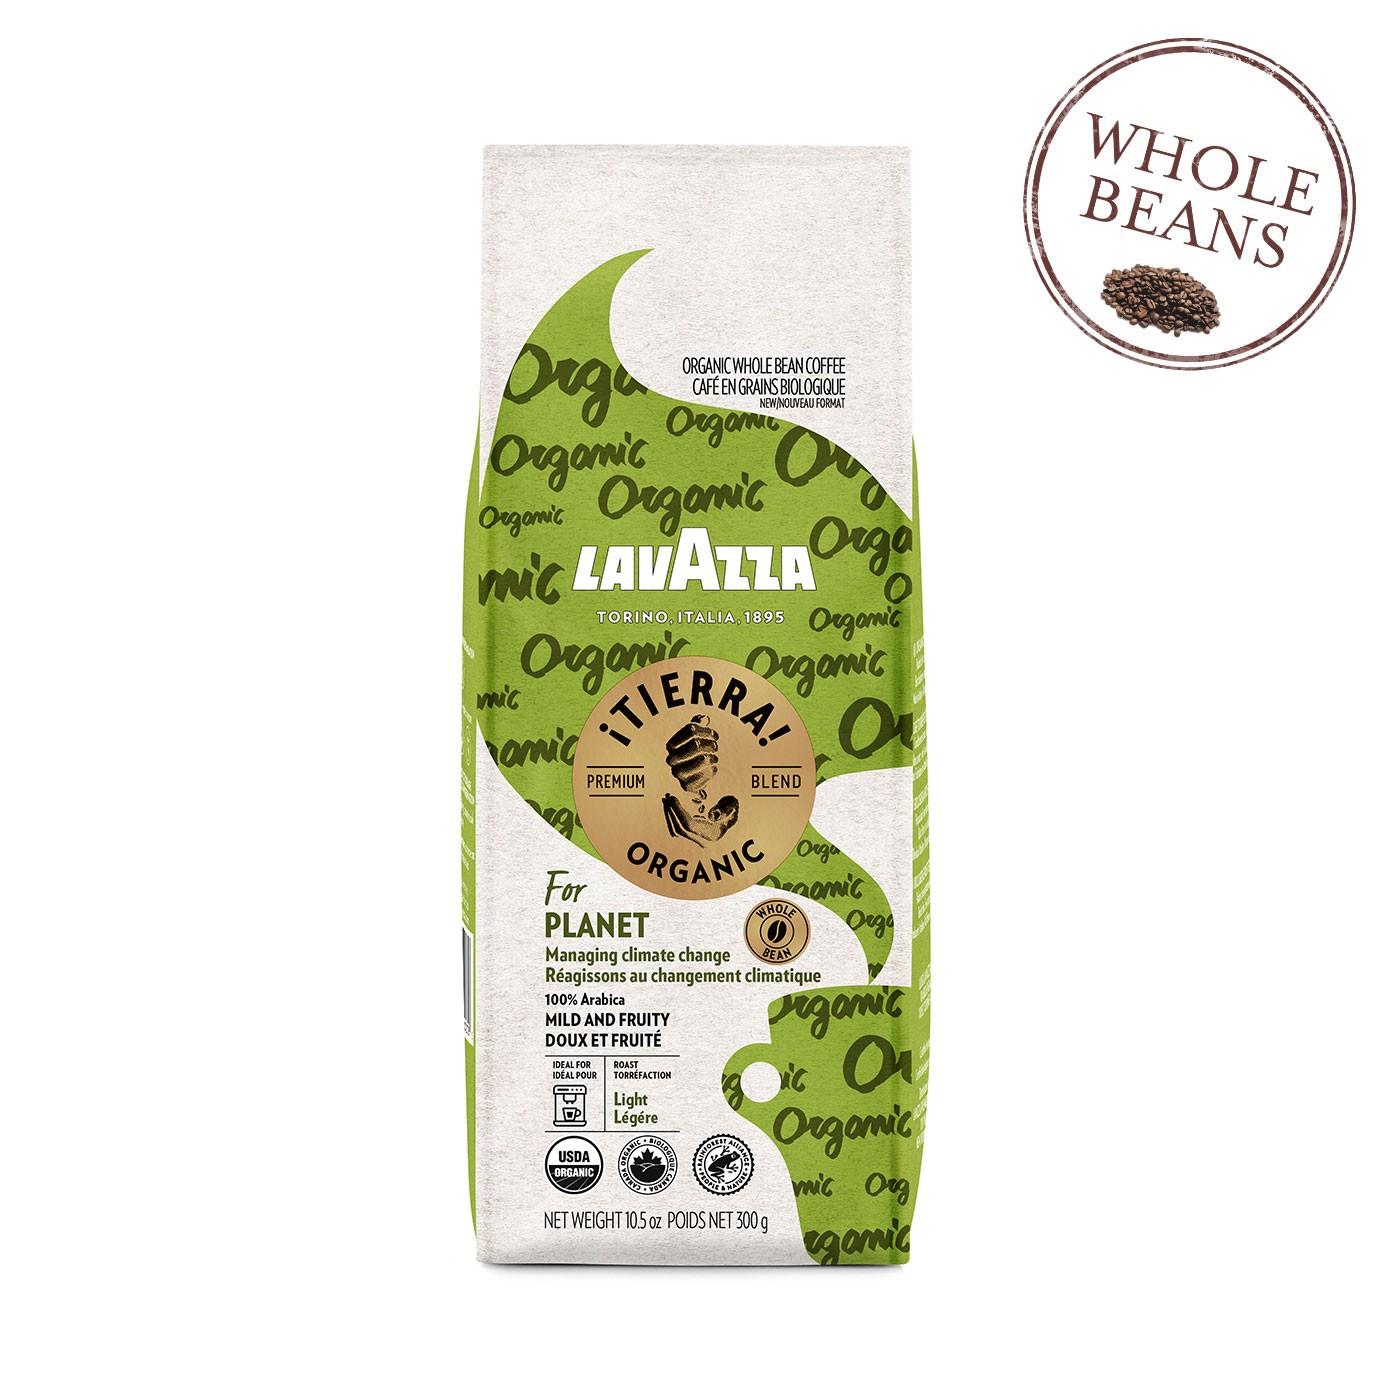 Organic ¡Tierra! Planet Whole Beans 10.5 oz - Lavazza | Eataly.com